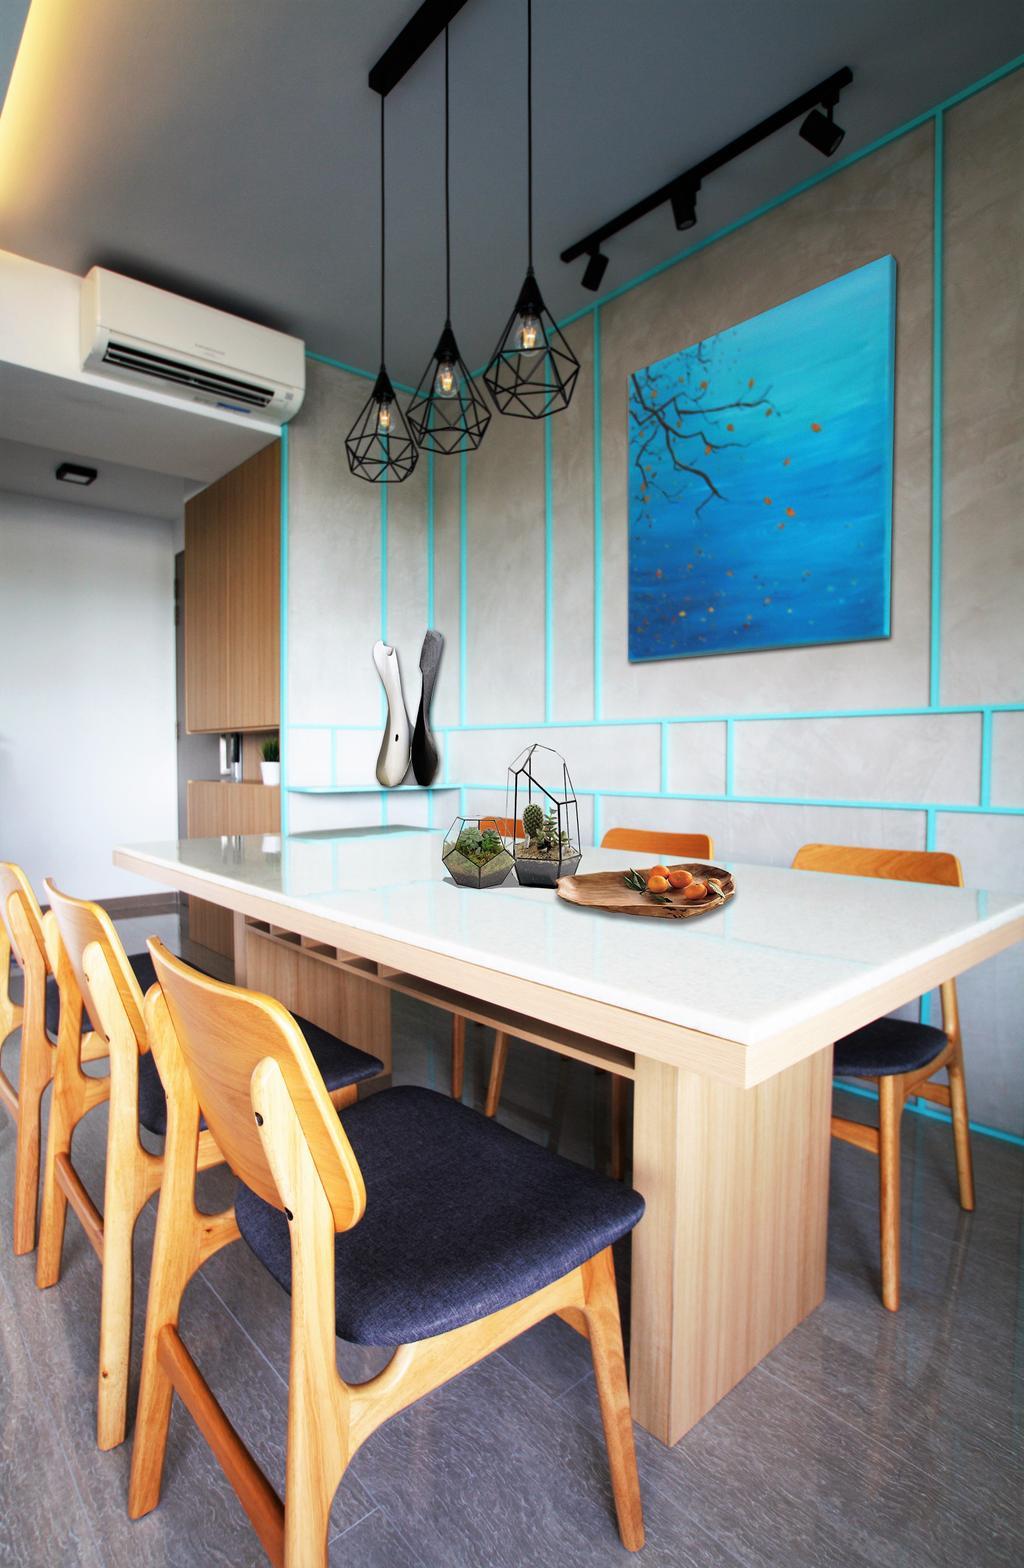 Condo, Punggol, Interior Designer, Intrigue-d Design Consultancy, Dining Table, Furniture, Table, Chair, Indoors, Interior Design, Dining Room, Room, Plywood, Wood